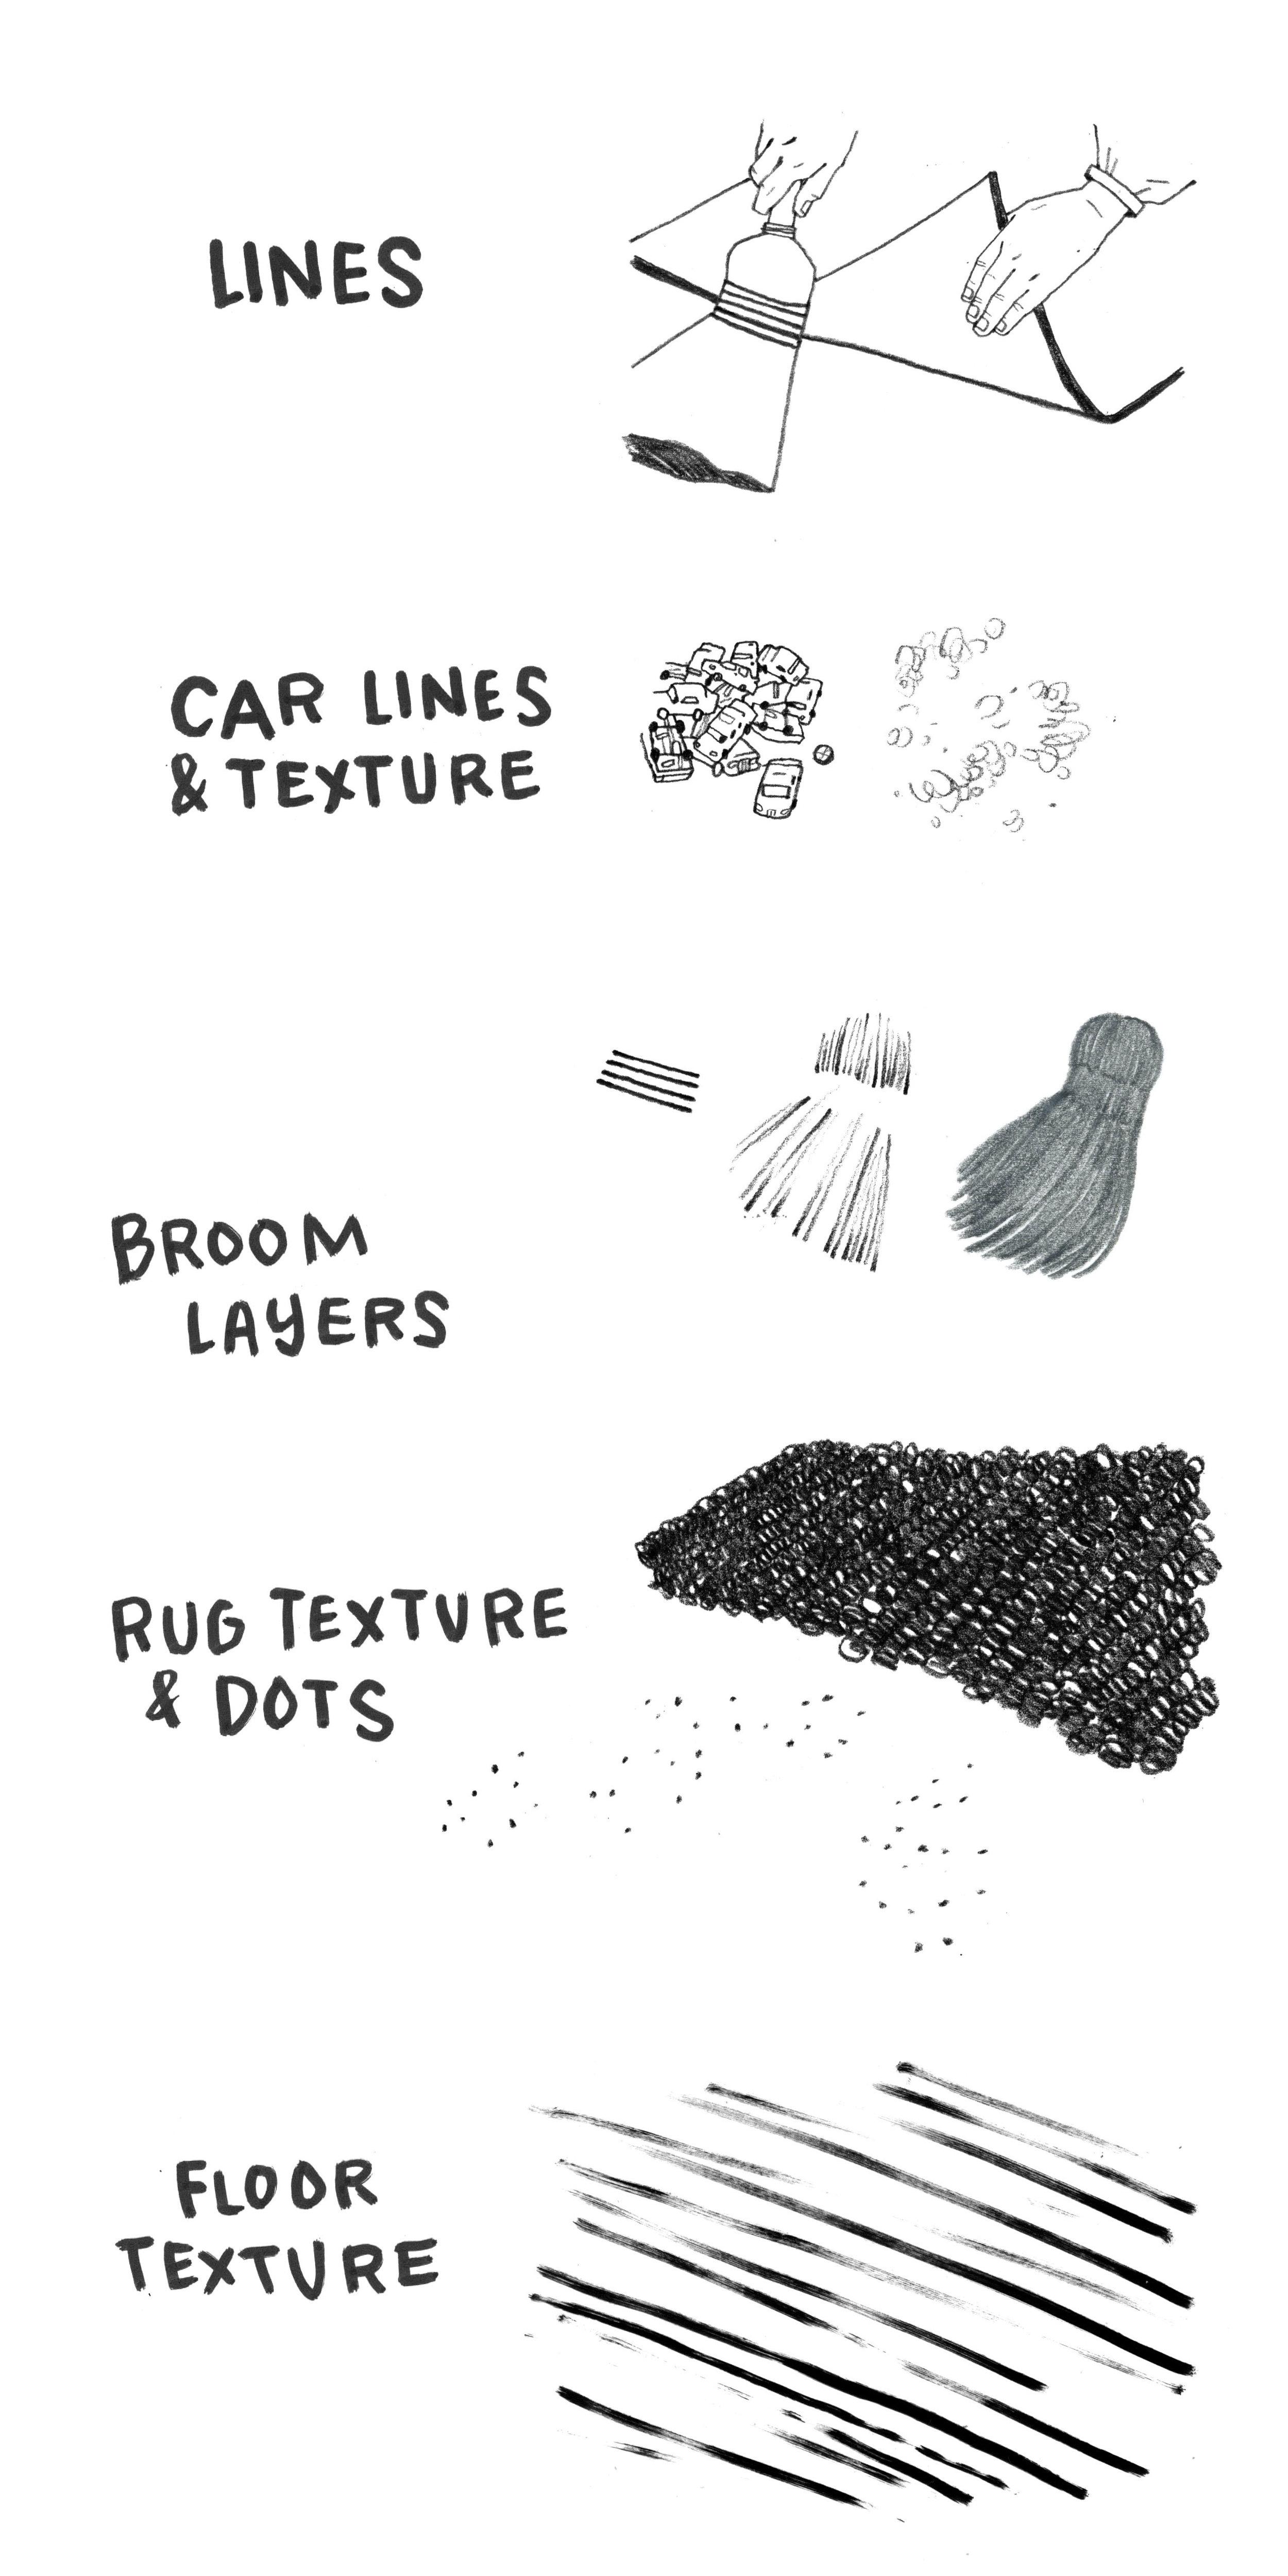 Drew Bardana - Mazda Lines and Textures